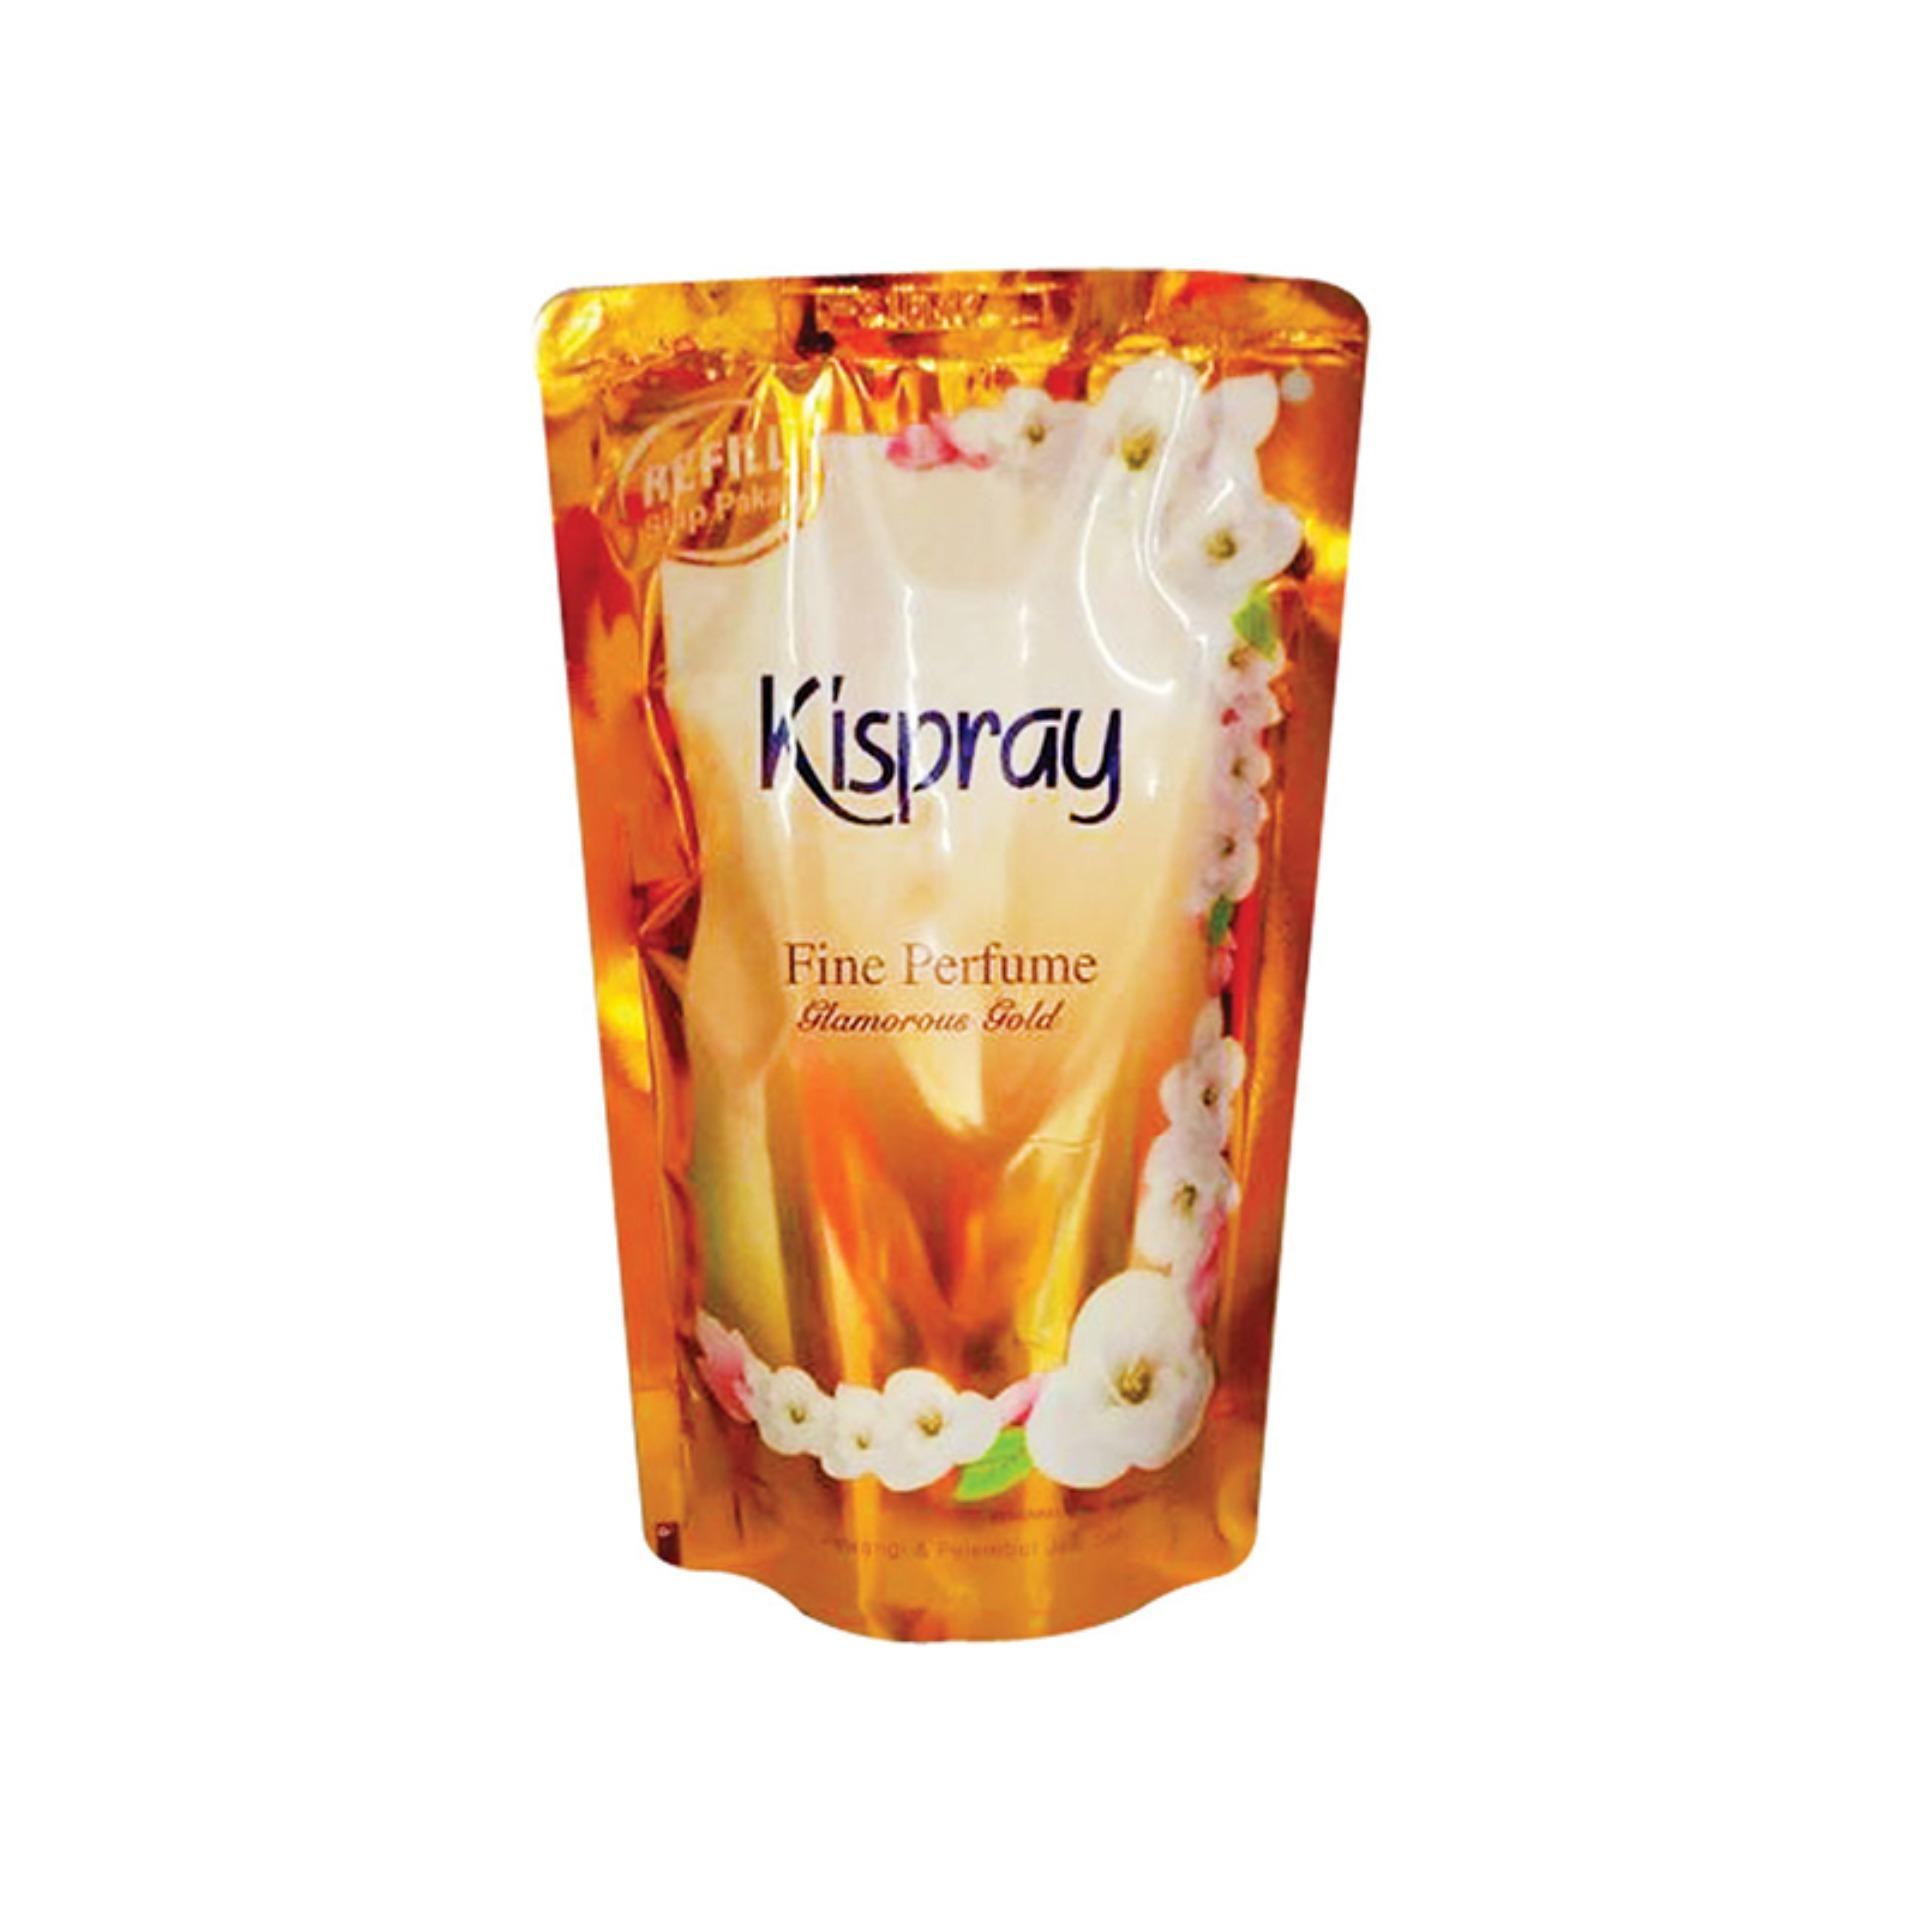 Kehebatan Jaco Kozuii Mineral Peeling Solution For Body Refill All With Sprayer Non Face Kispray Fine Perfume Glamorous Gold 300ml